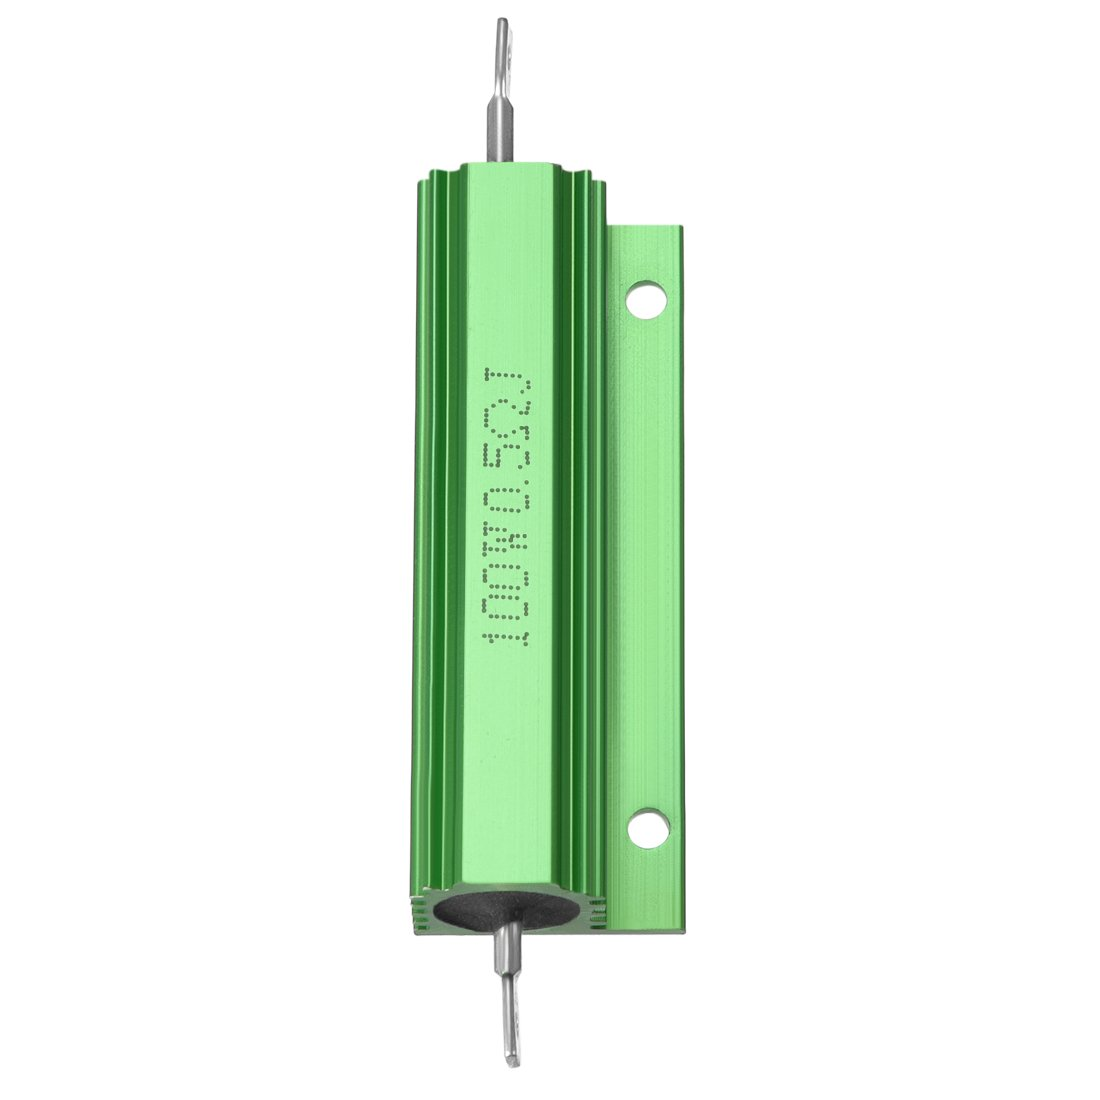 Sourcingmap 2 St/ück Aluminiumgeh/äuse Widerstand 100 W 10 Ohm Drahtgewickelt Gelb f/ür LED Ersatz Konverter 100 W 10 RJ